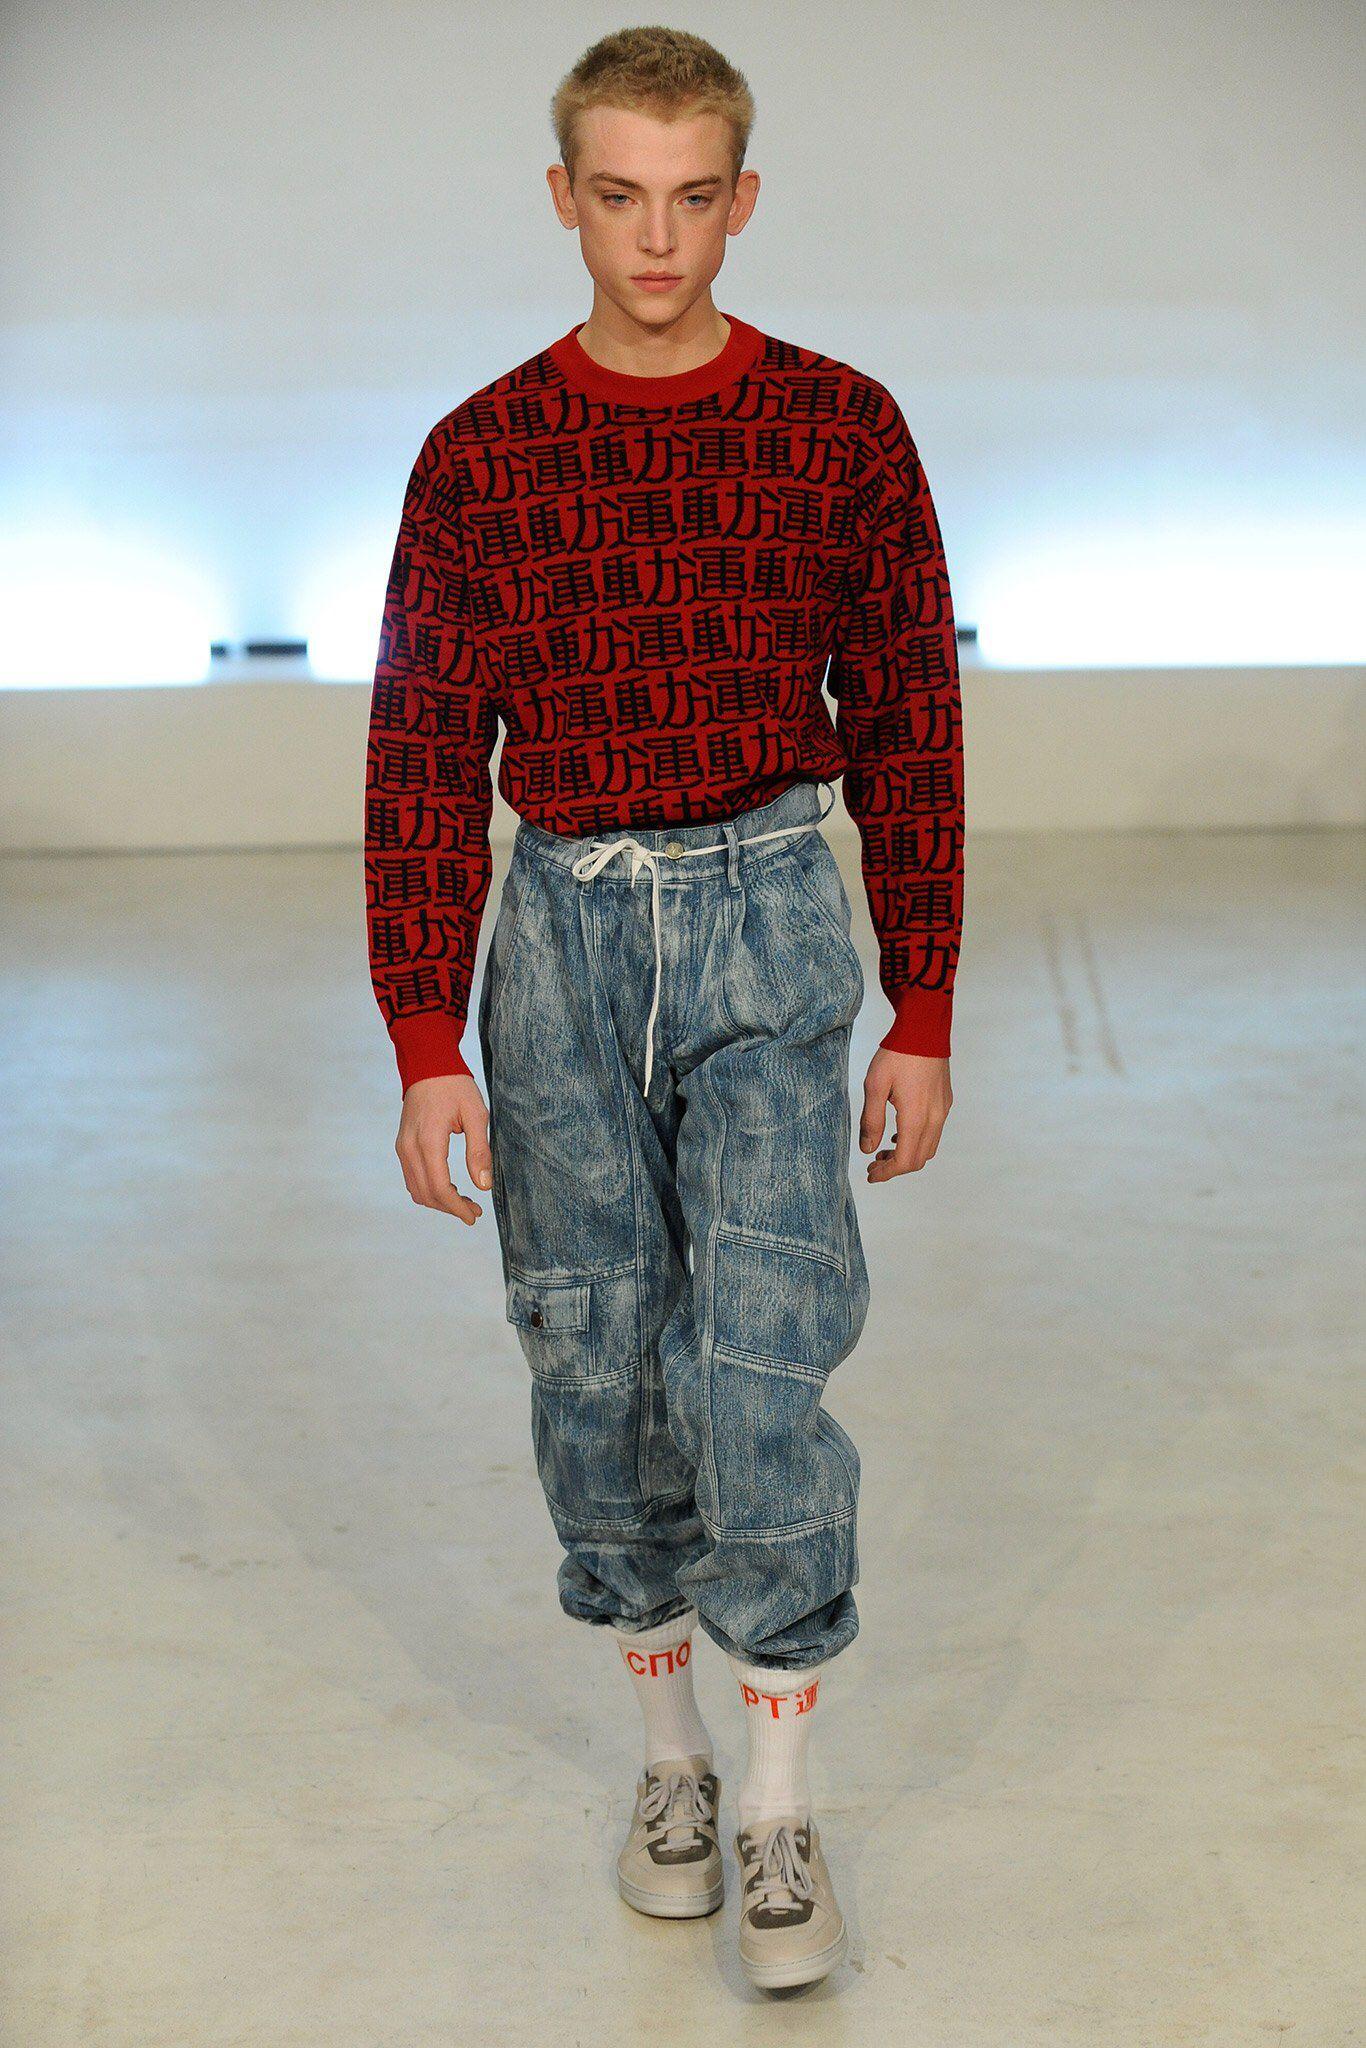 Gosha Rubchinskiy Fall 2015 Menswear Fashion Show Collection